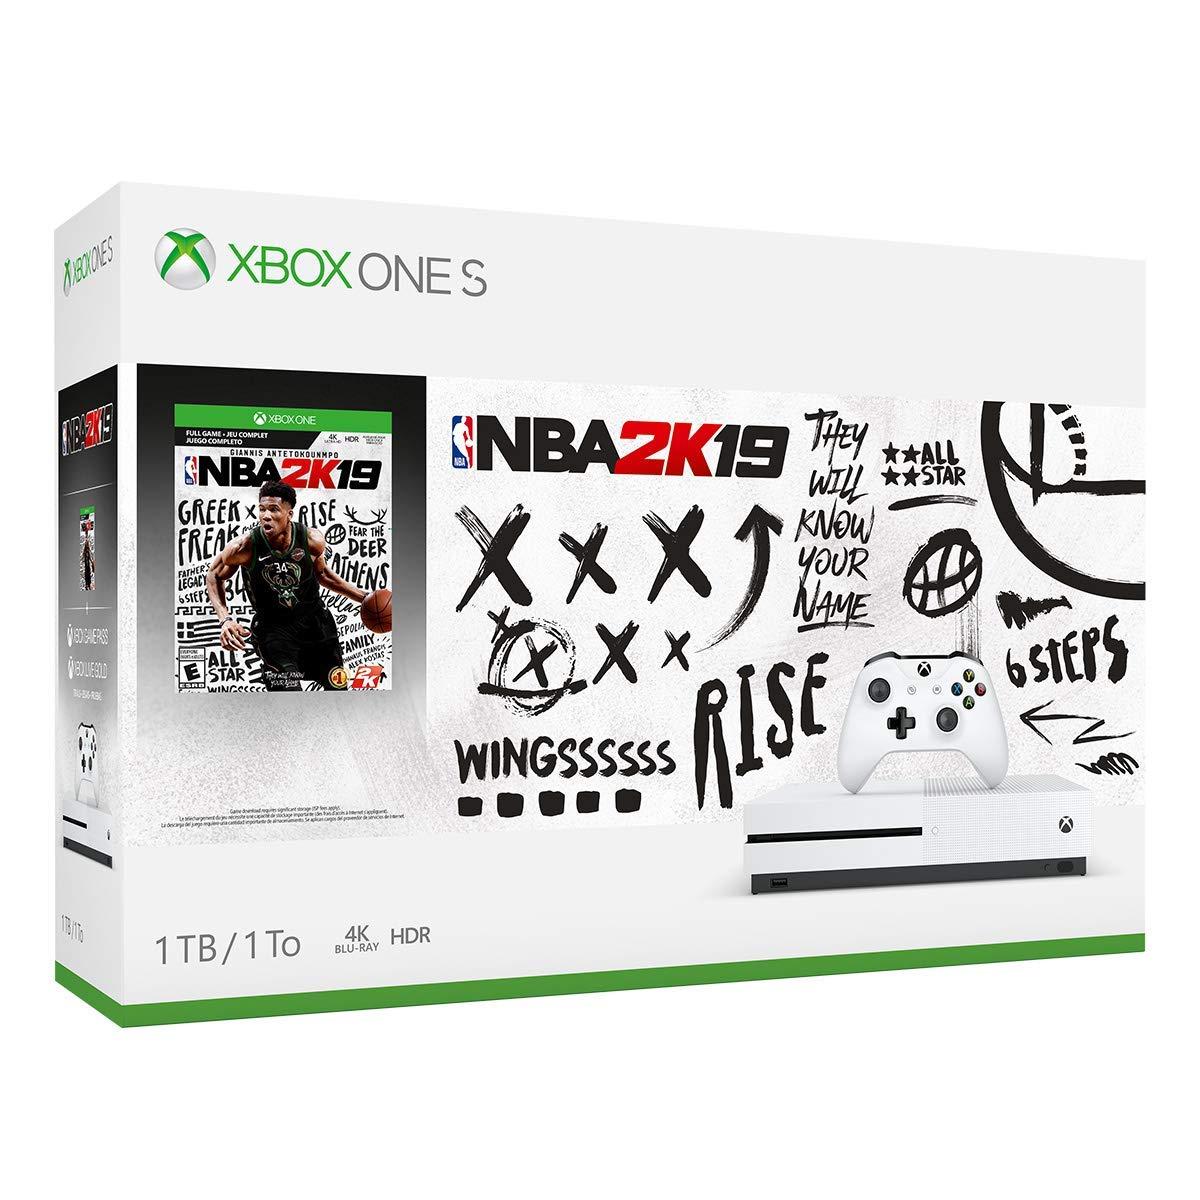 Xbox One S 1TB Console - NBA 2K19 Bundle (Discontinued) (Renewed)